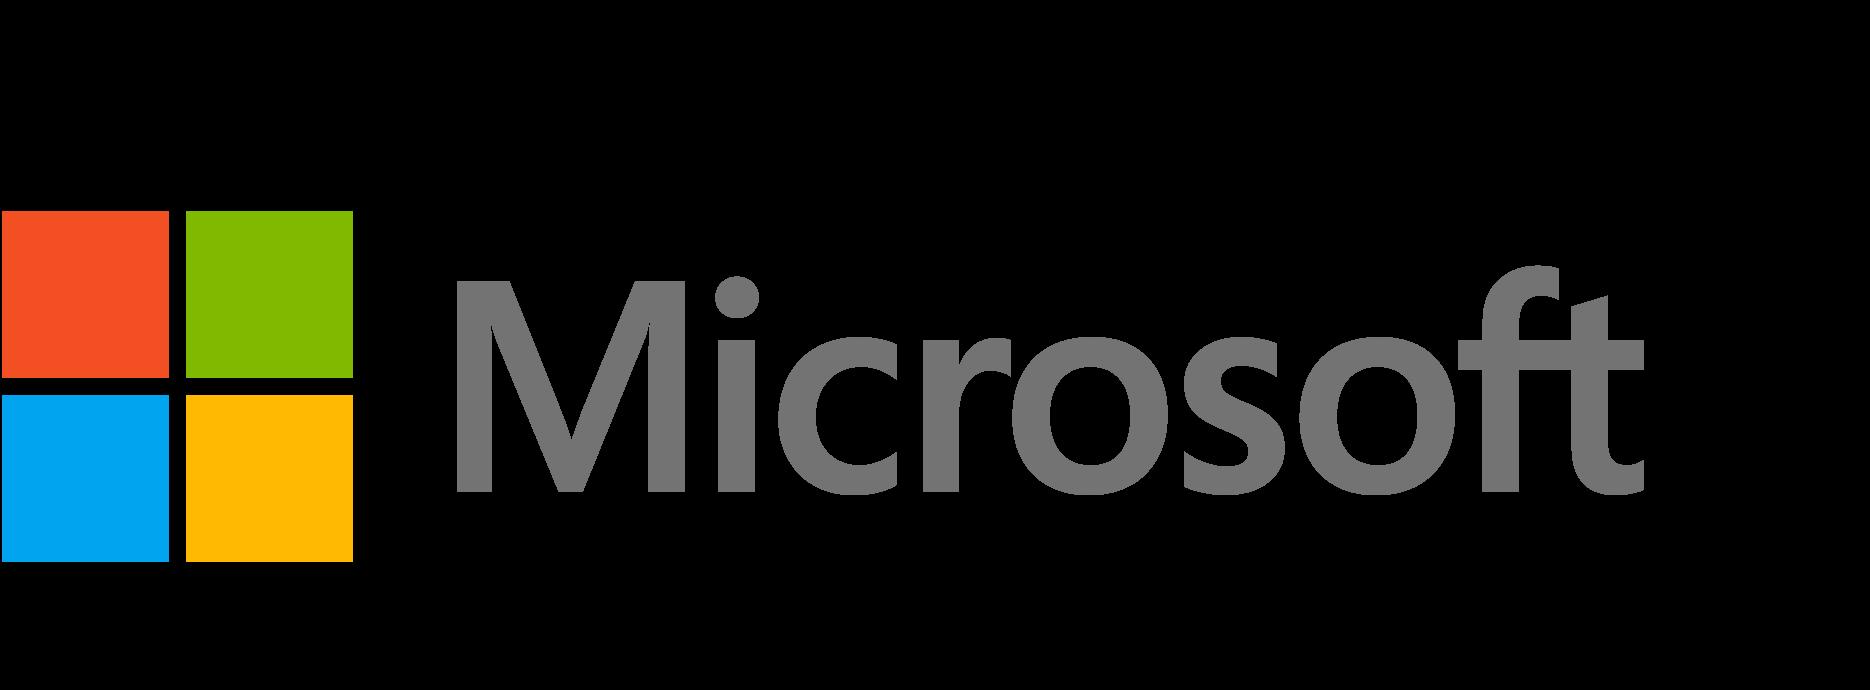 msft_logo_rgb_c-gray-3b156229